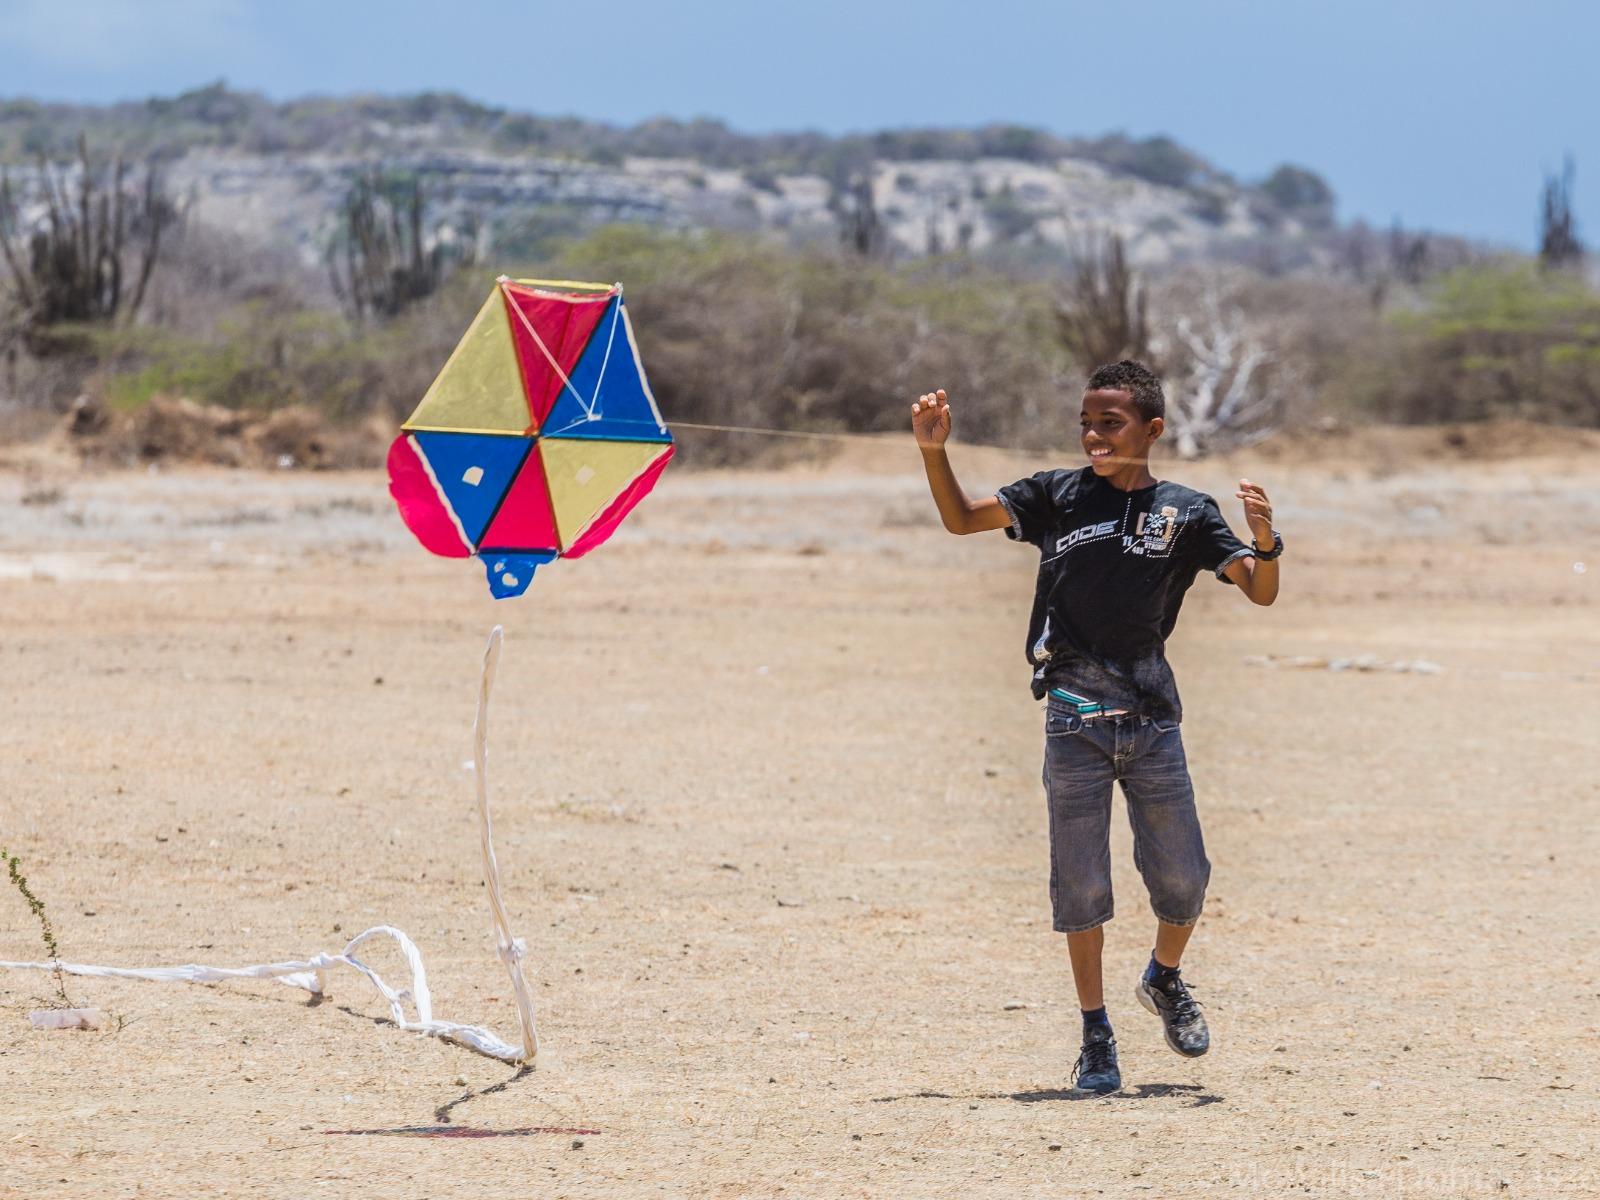 Vliegerwedstrijd 'Kontèst di Fli'